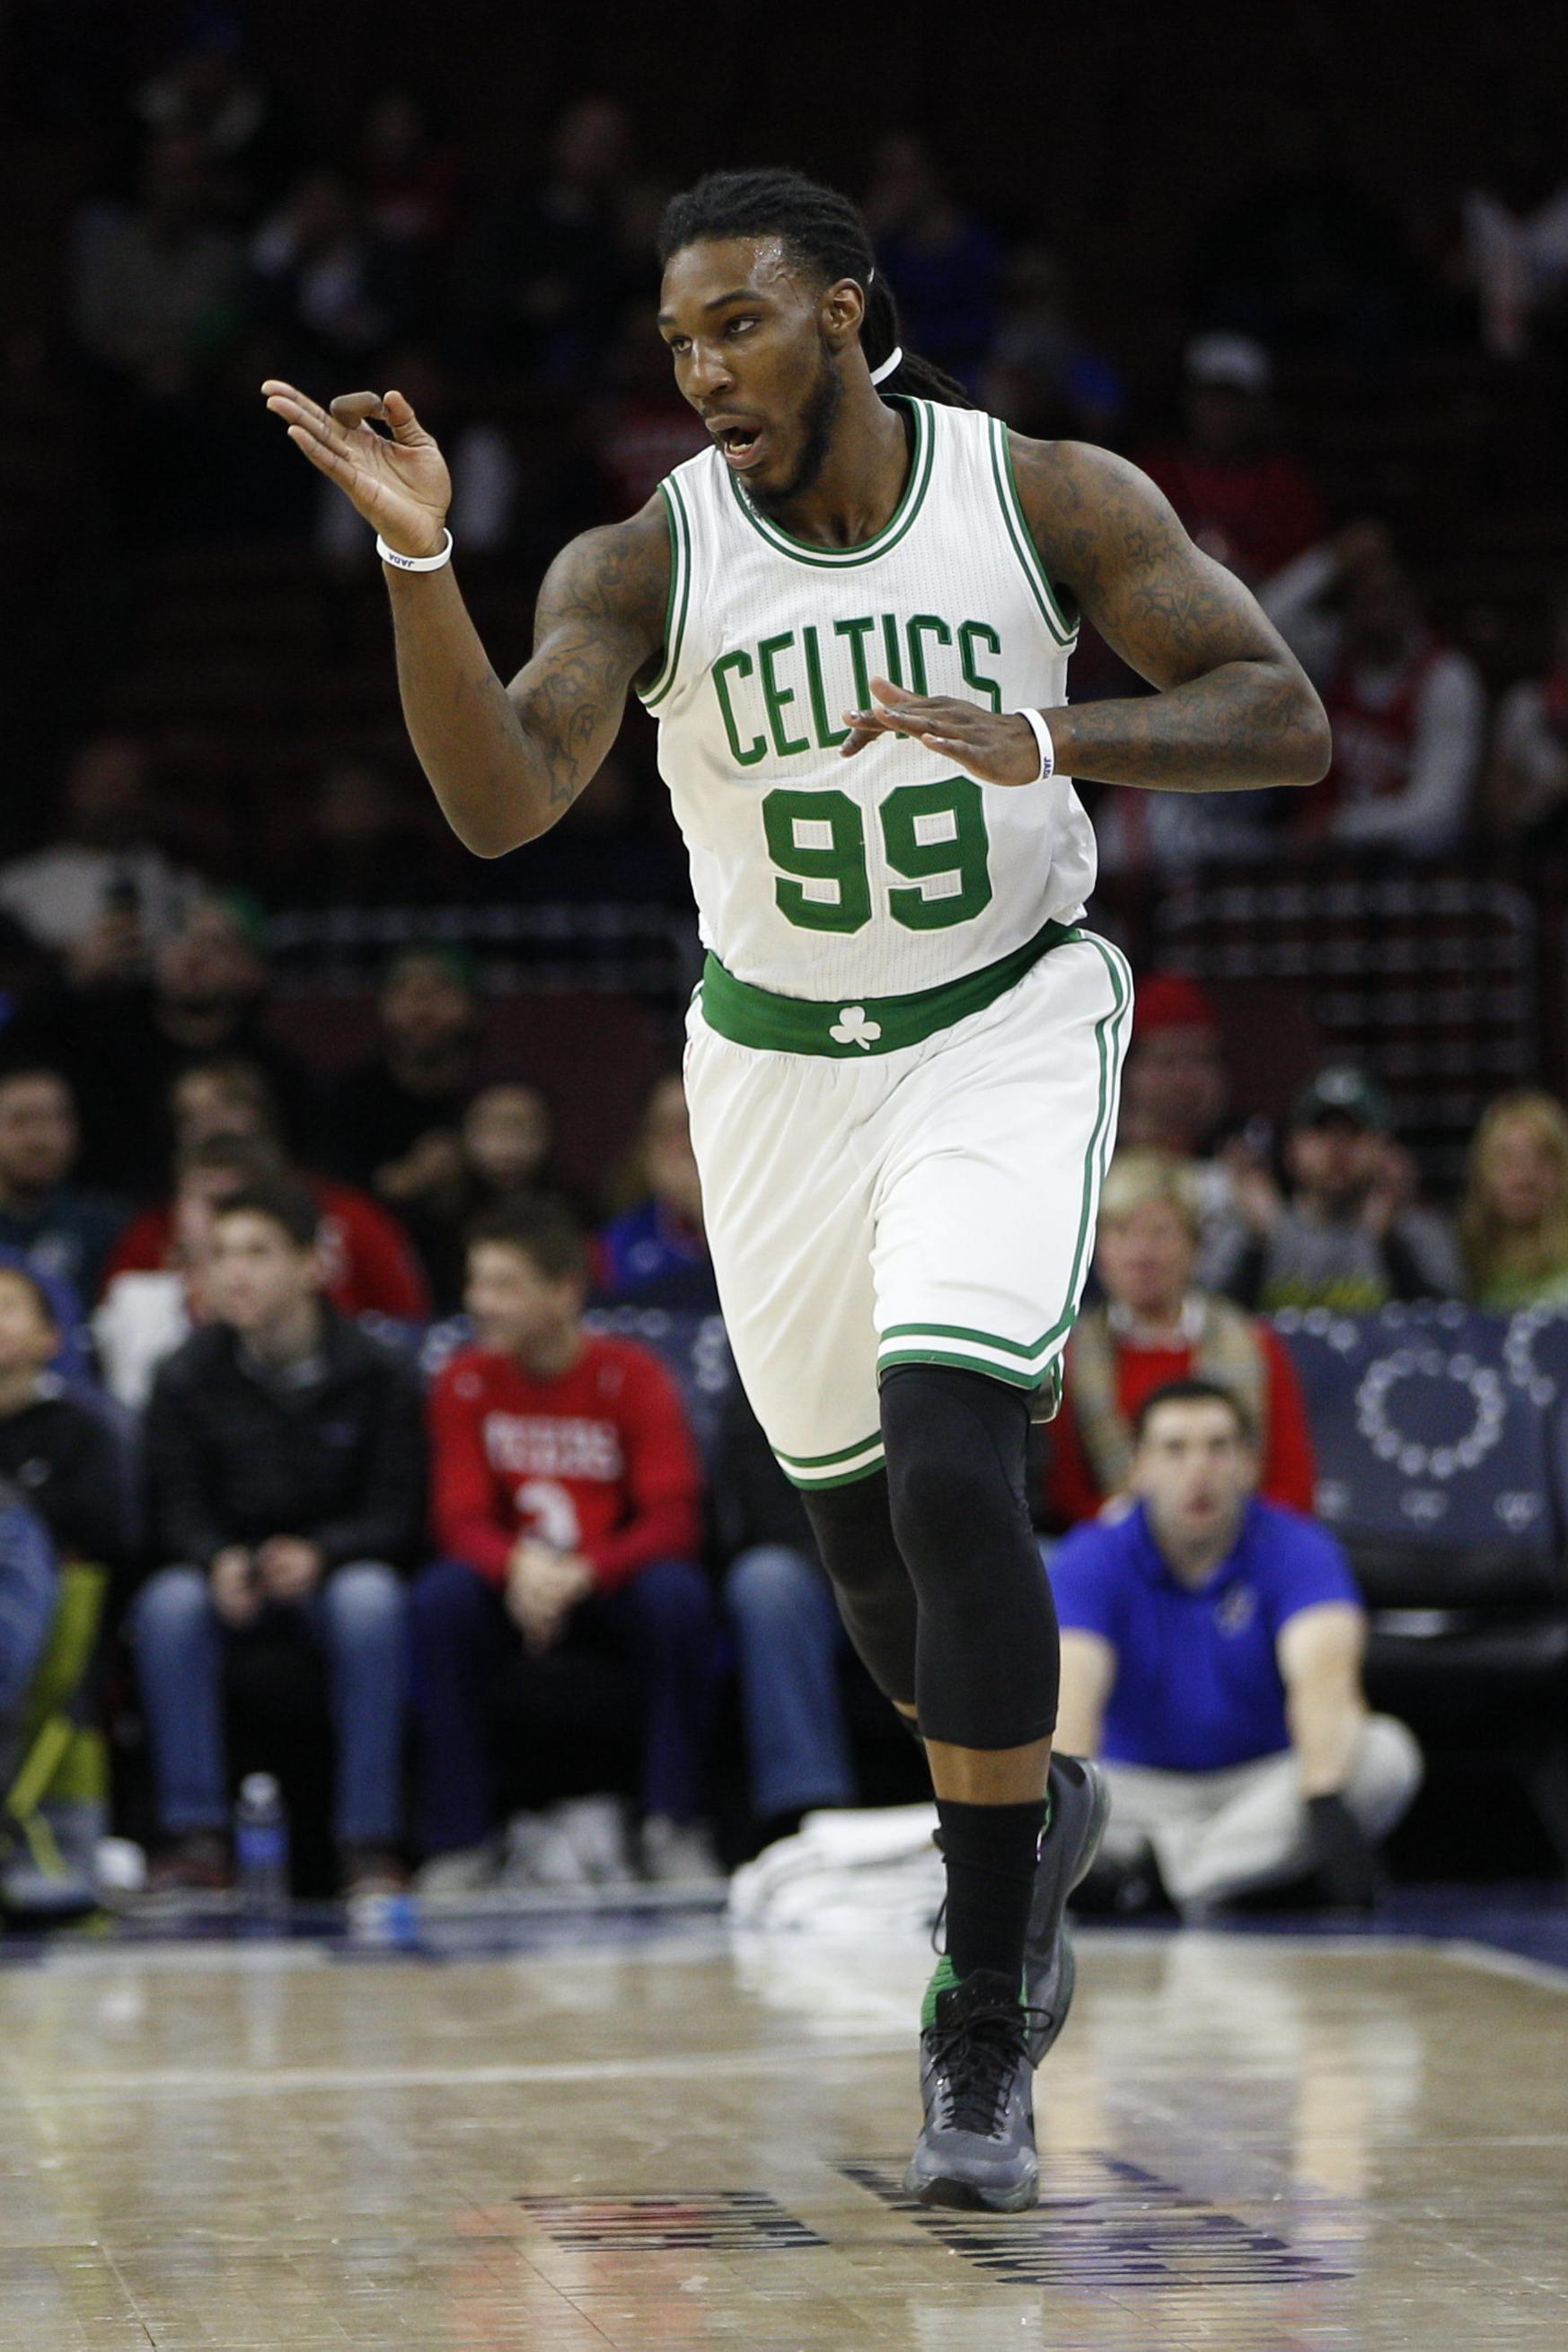 Boston Celtics' Jae Crowder reacts to his 3-pointer during the first half of an NBA basketball game against the Philadelphia 76ers, Sunday, Jan. 24, 2016, in Philadelphia. (AP Photo/Chris Szagola)